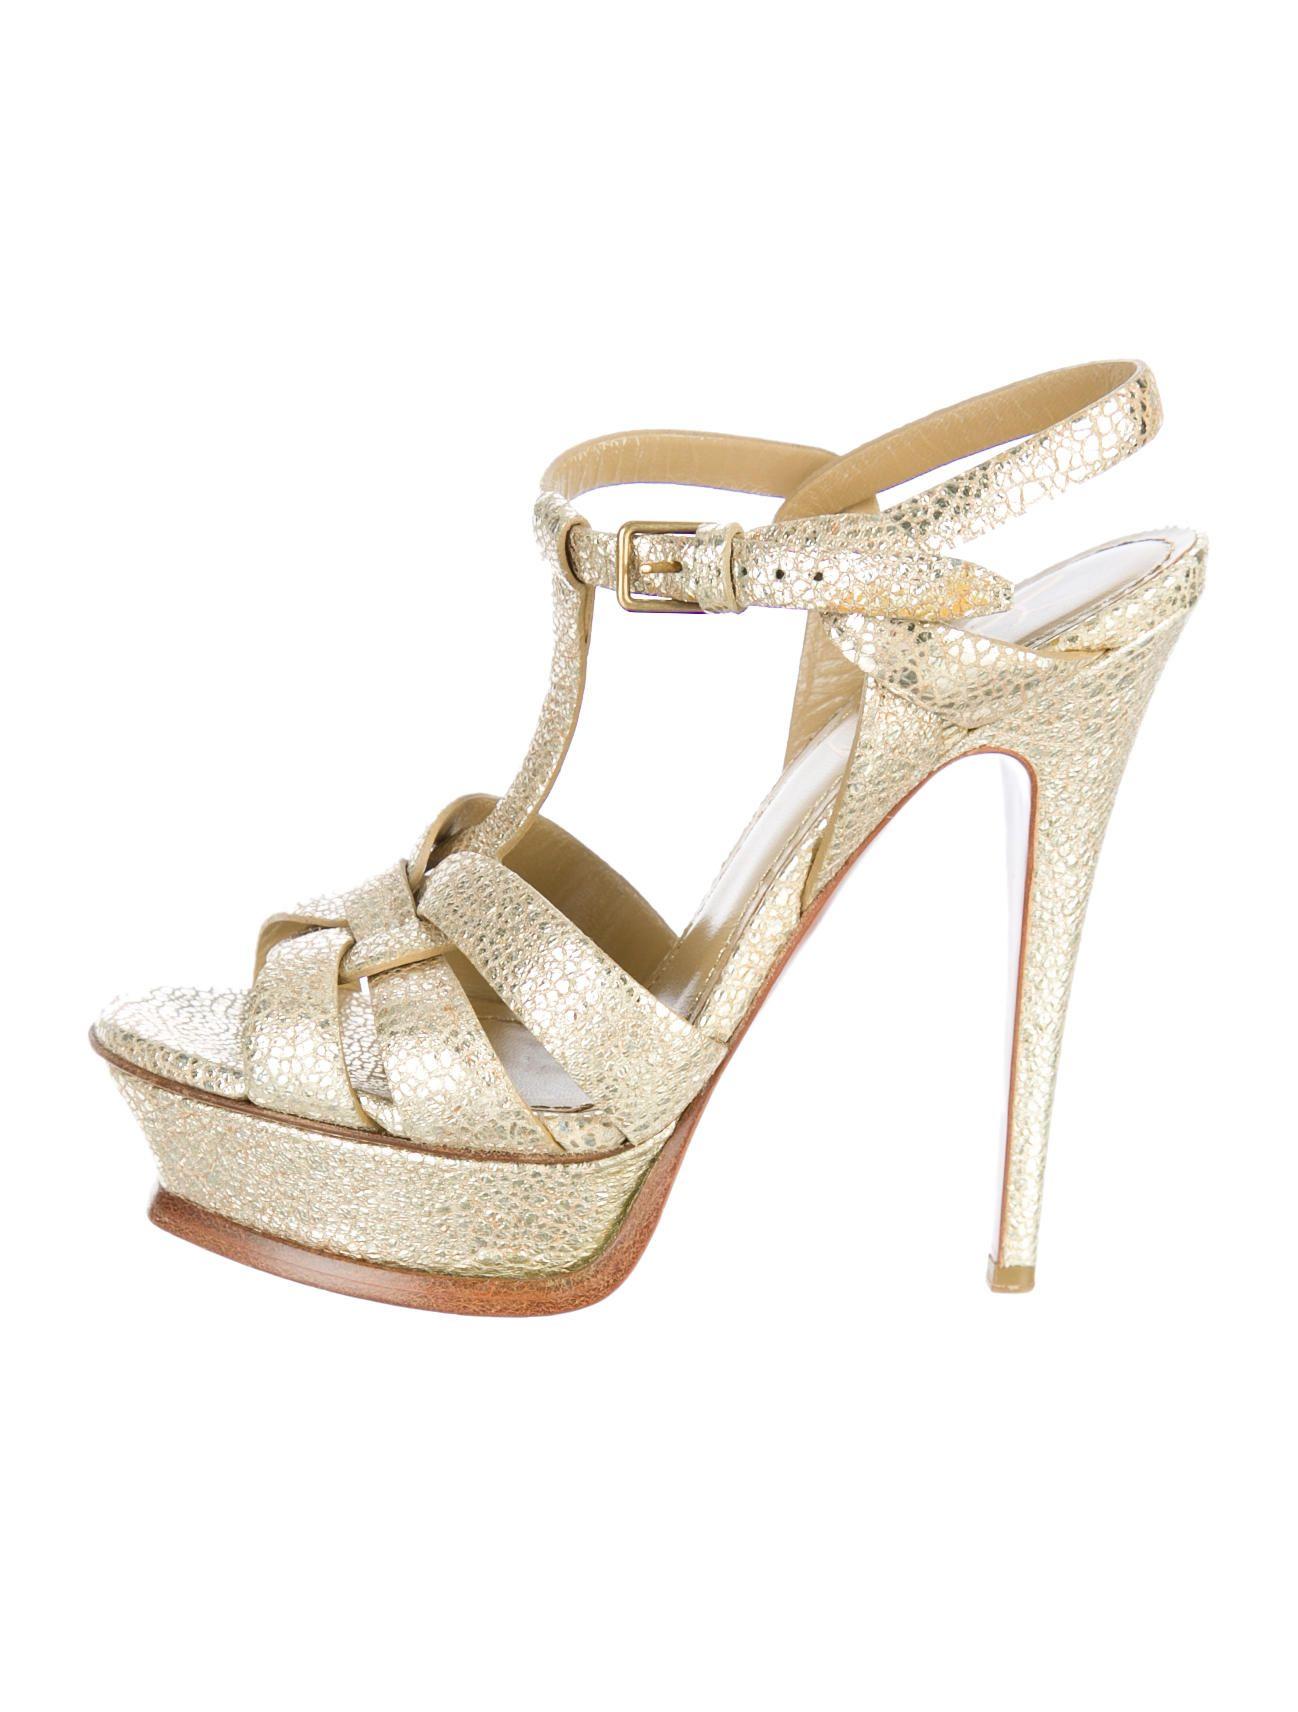 6889744d51e Yves Saint Laurent Metallic Tribute Sandals What I Want